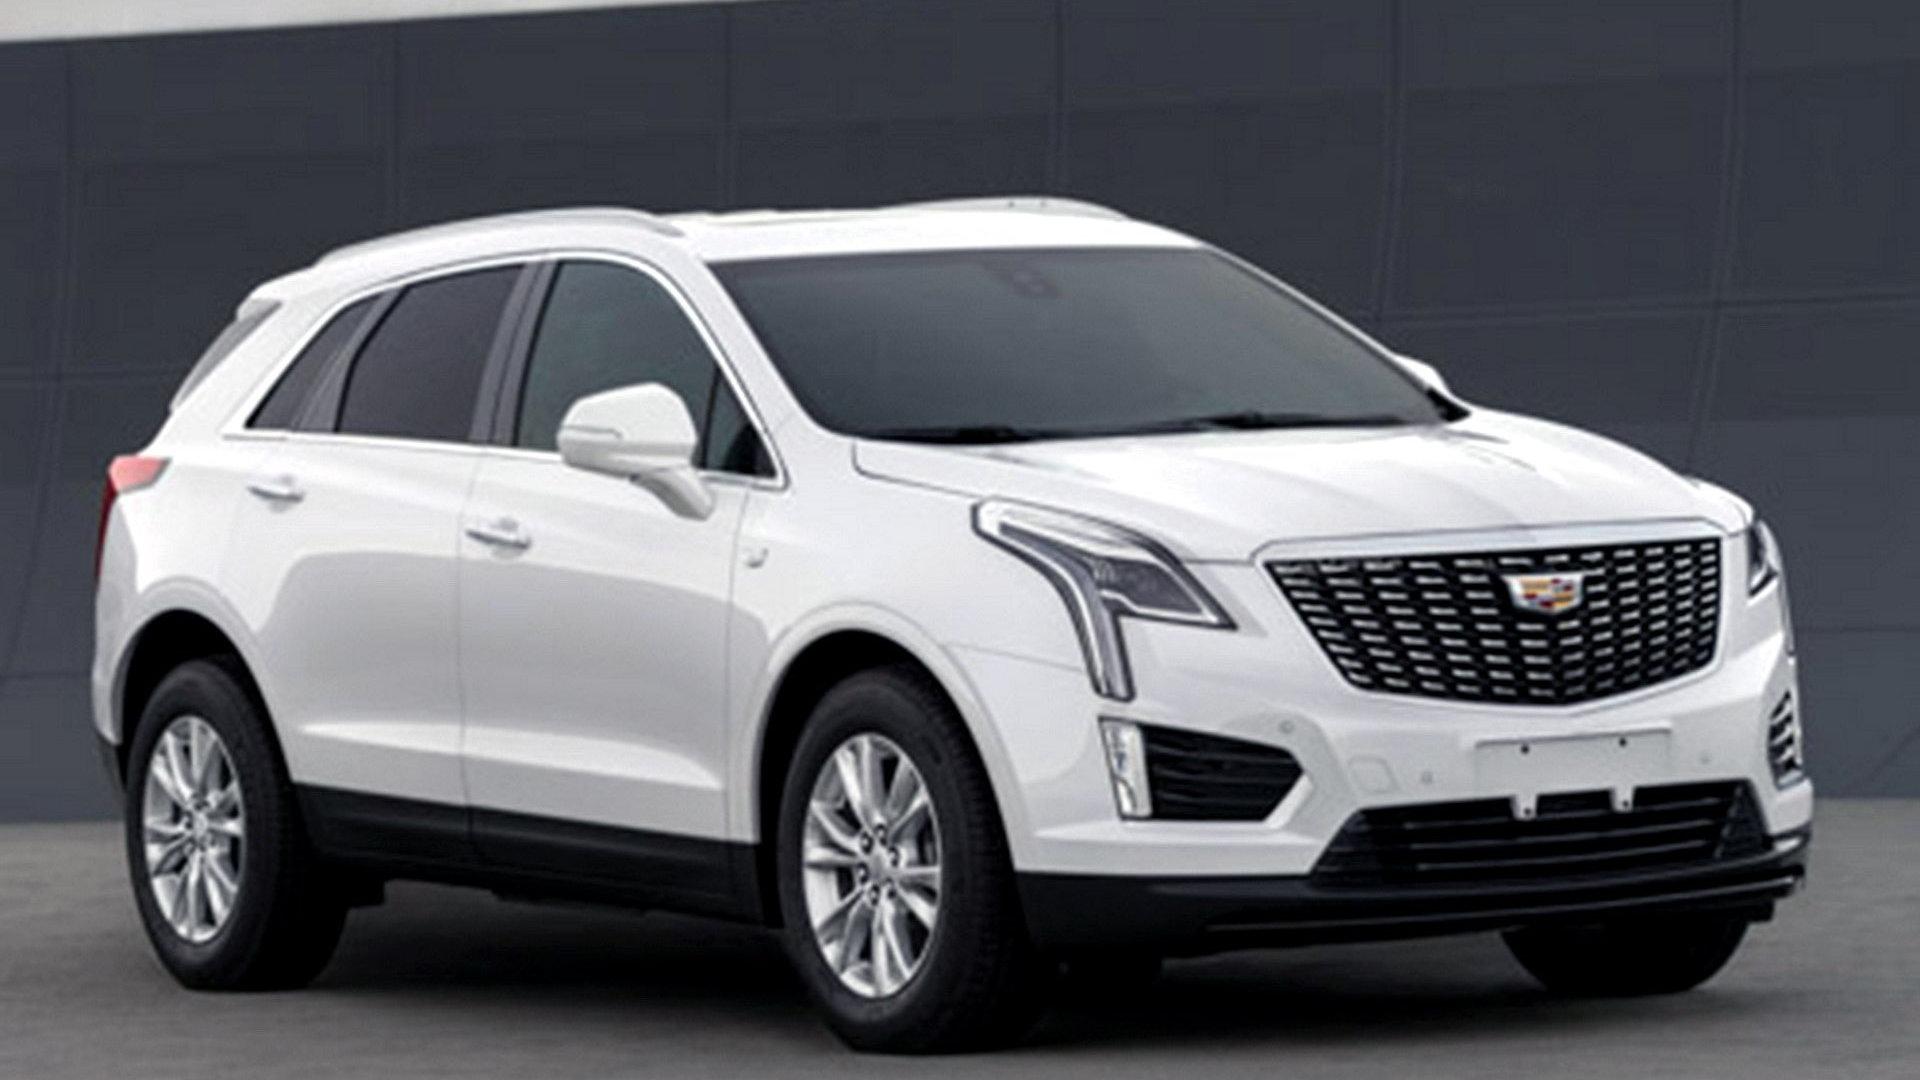 2020 Cadillac XT5 leak - Image via Autohome